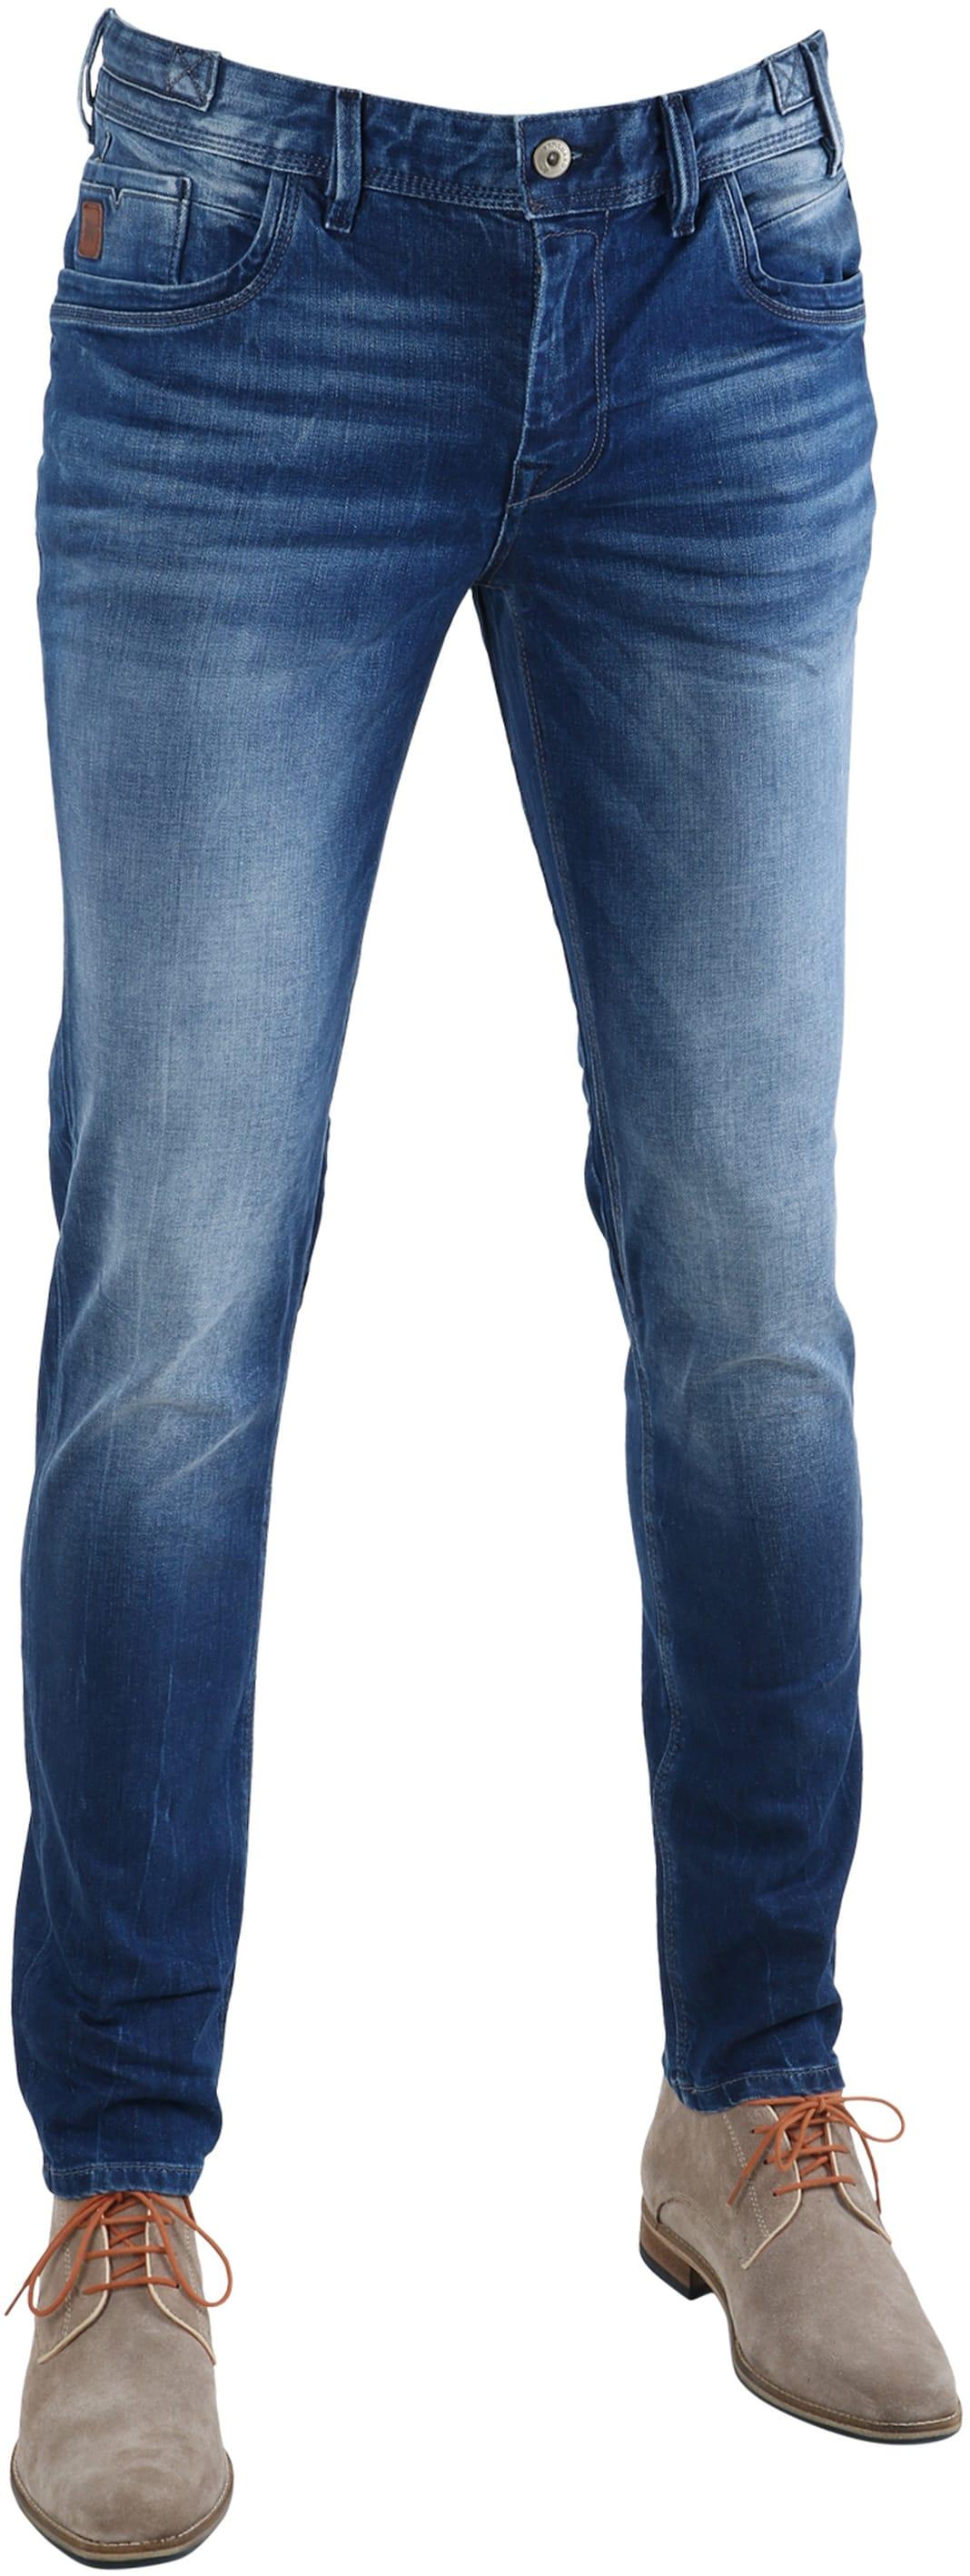 Vanguard V8 Racer Jeans Blau foto 0